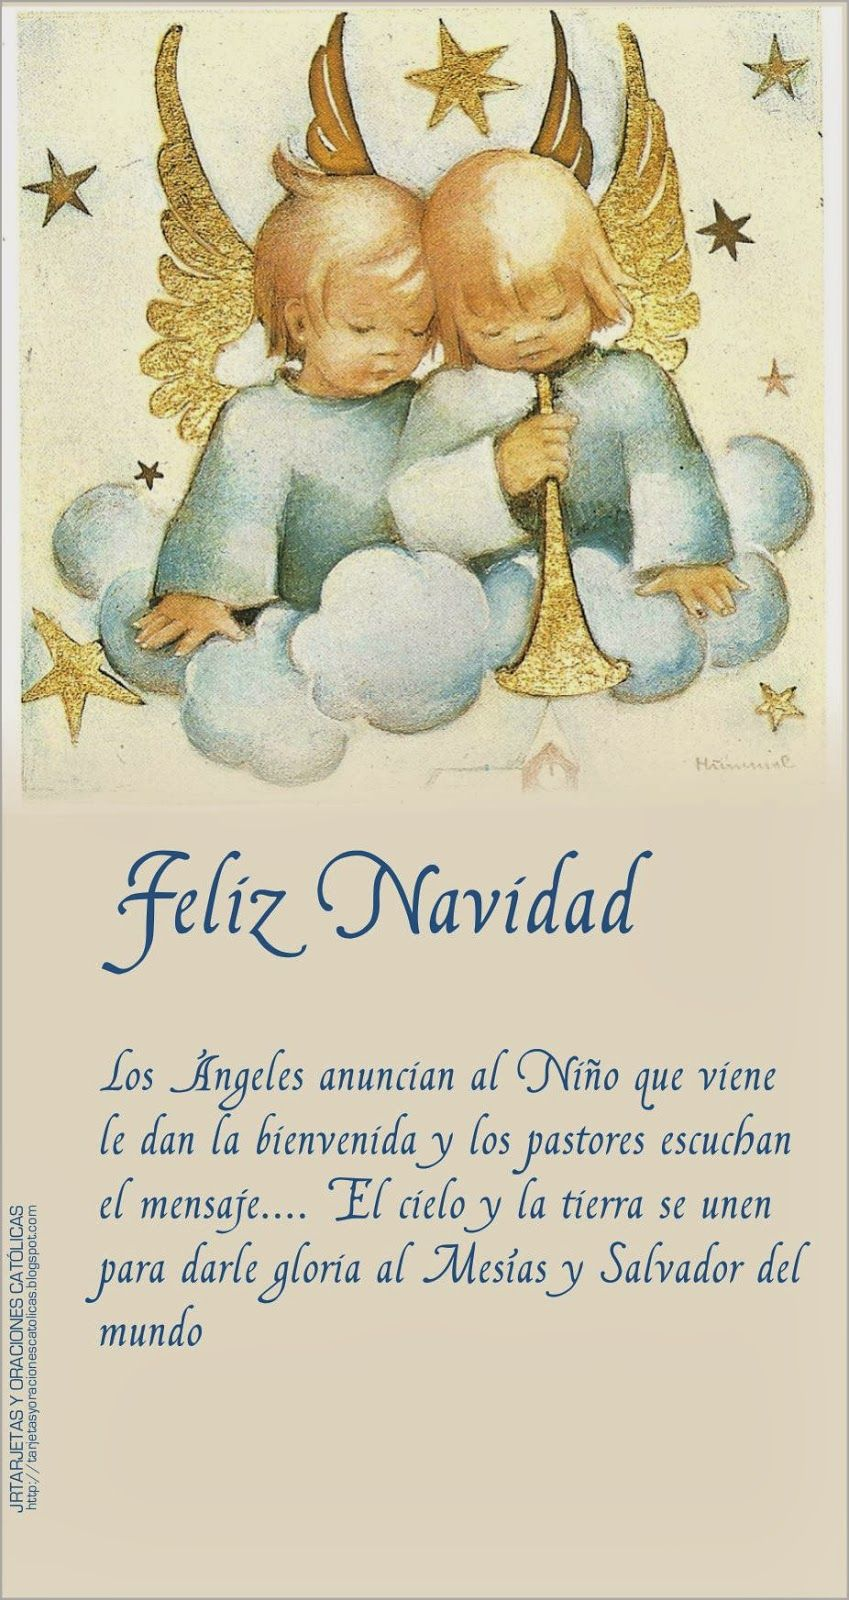 Tarjetas y oraciones catolicas tarjetas navide as jes s - Dibujos tarjetas navidenas ...